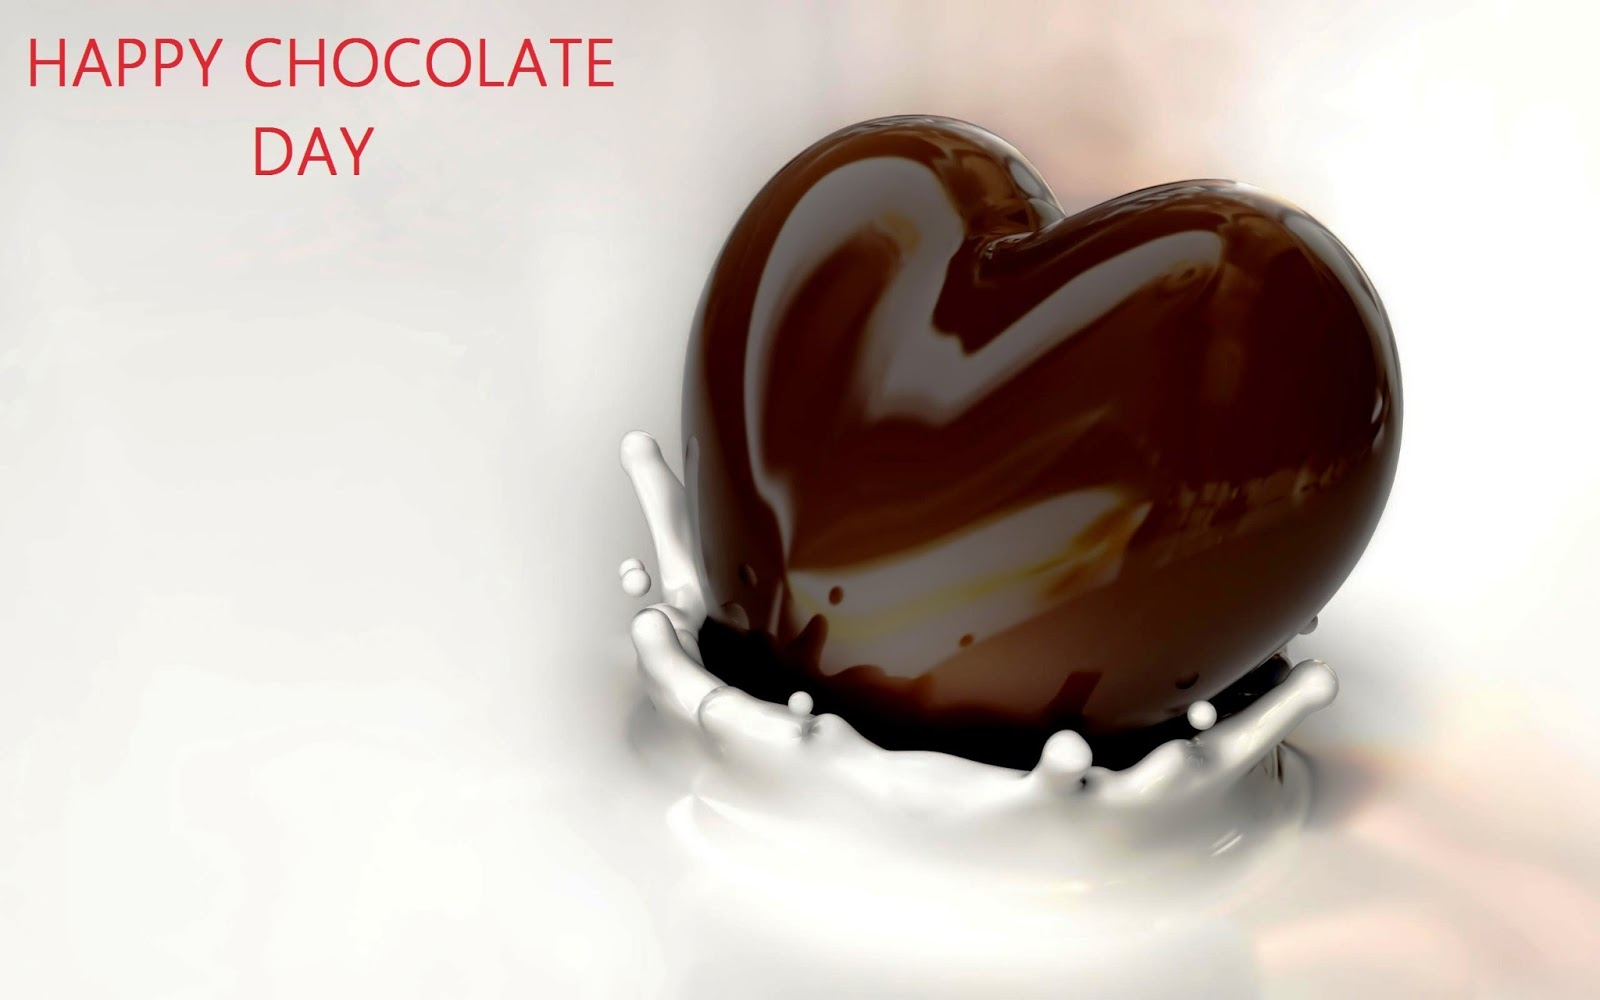 http://3.bp.blogspot.com/-UmHNB3XD00Q/URI9QU44GQI/AAAAAAAAA0s/u4duM5U0fro/s1600/chocolate-Day-HD-Wallpaper.jpg